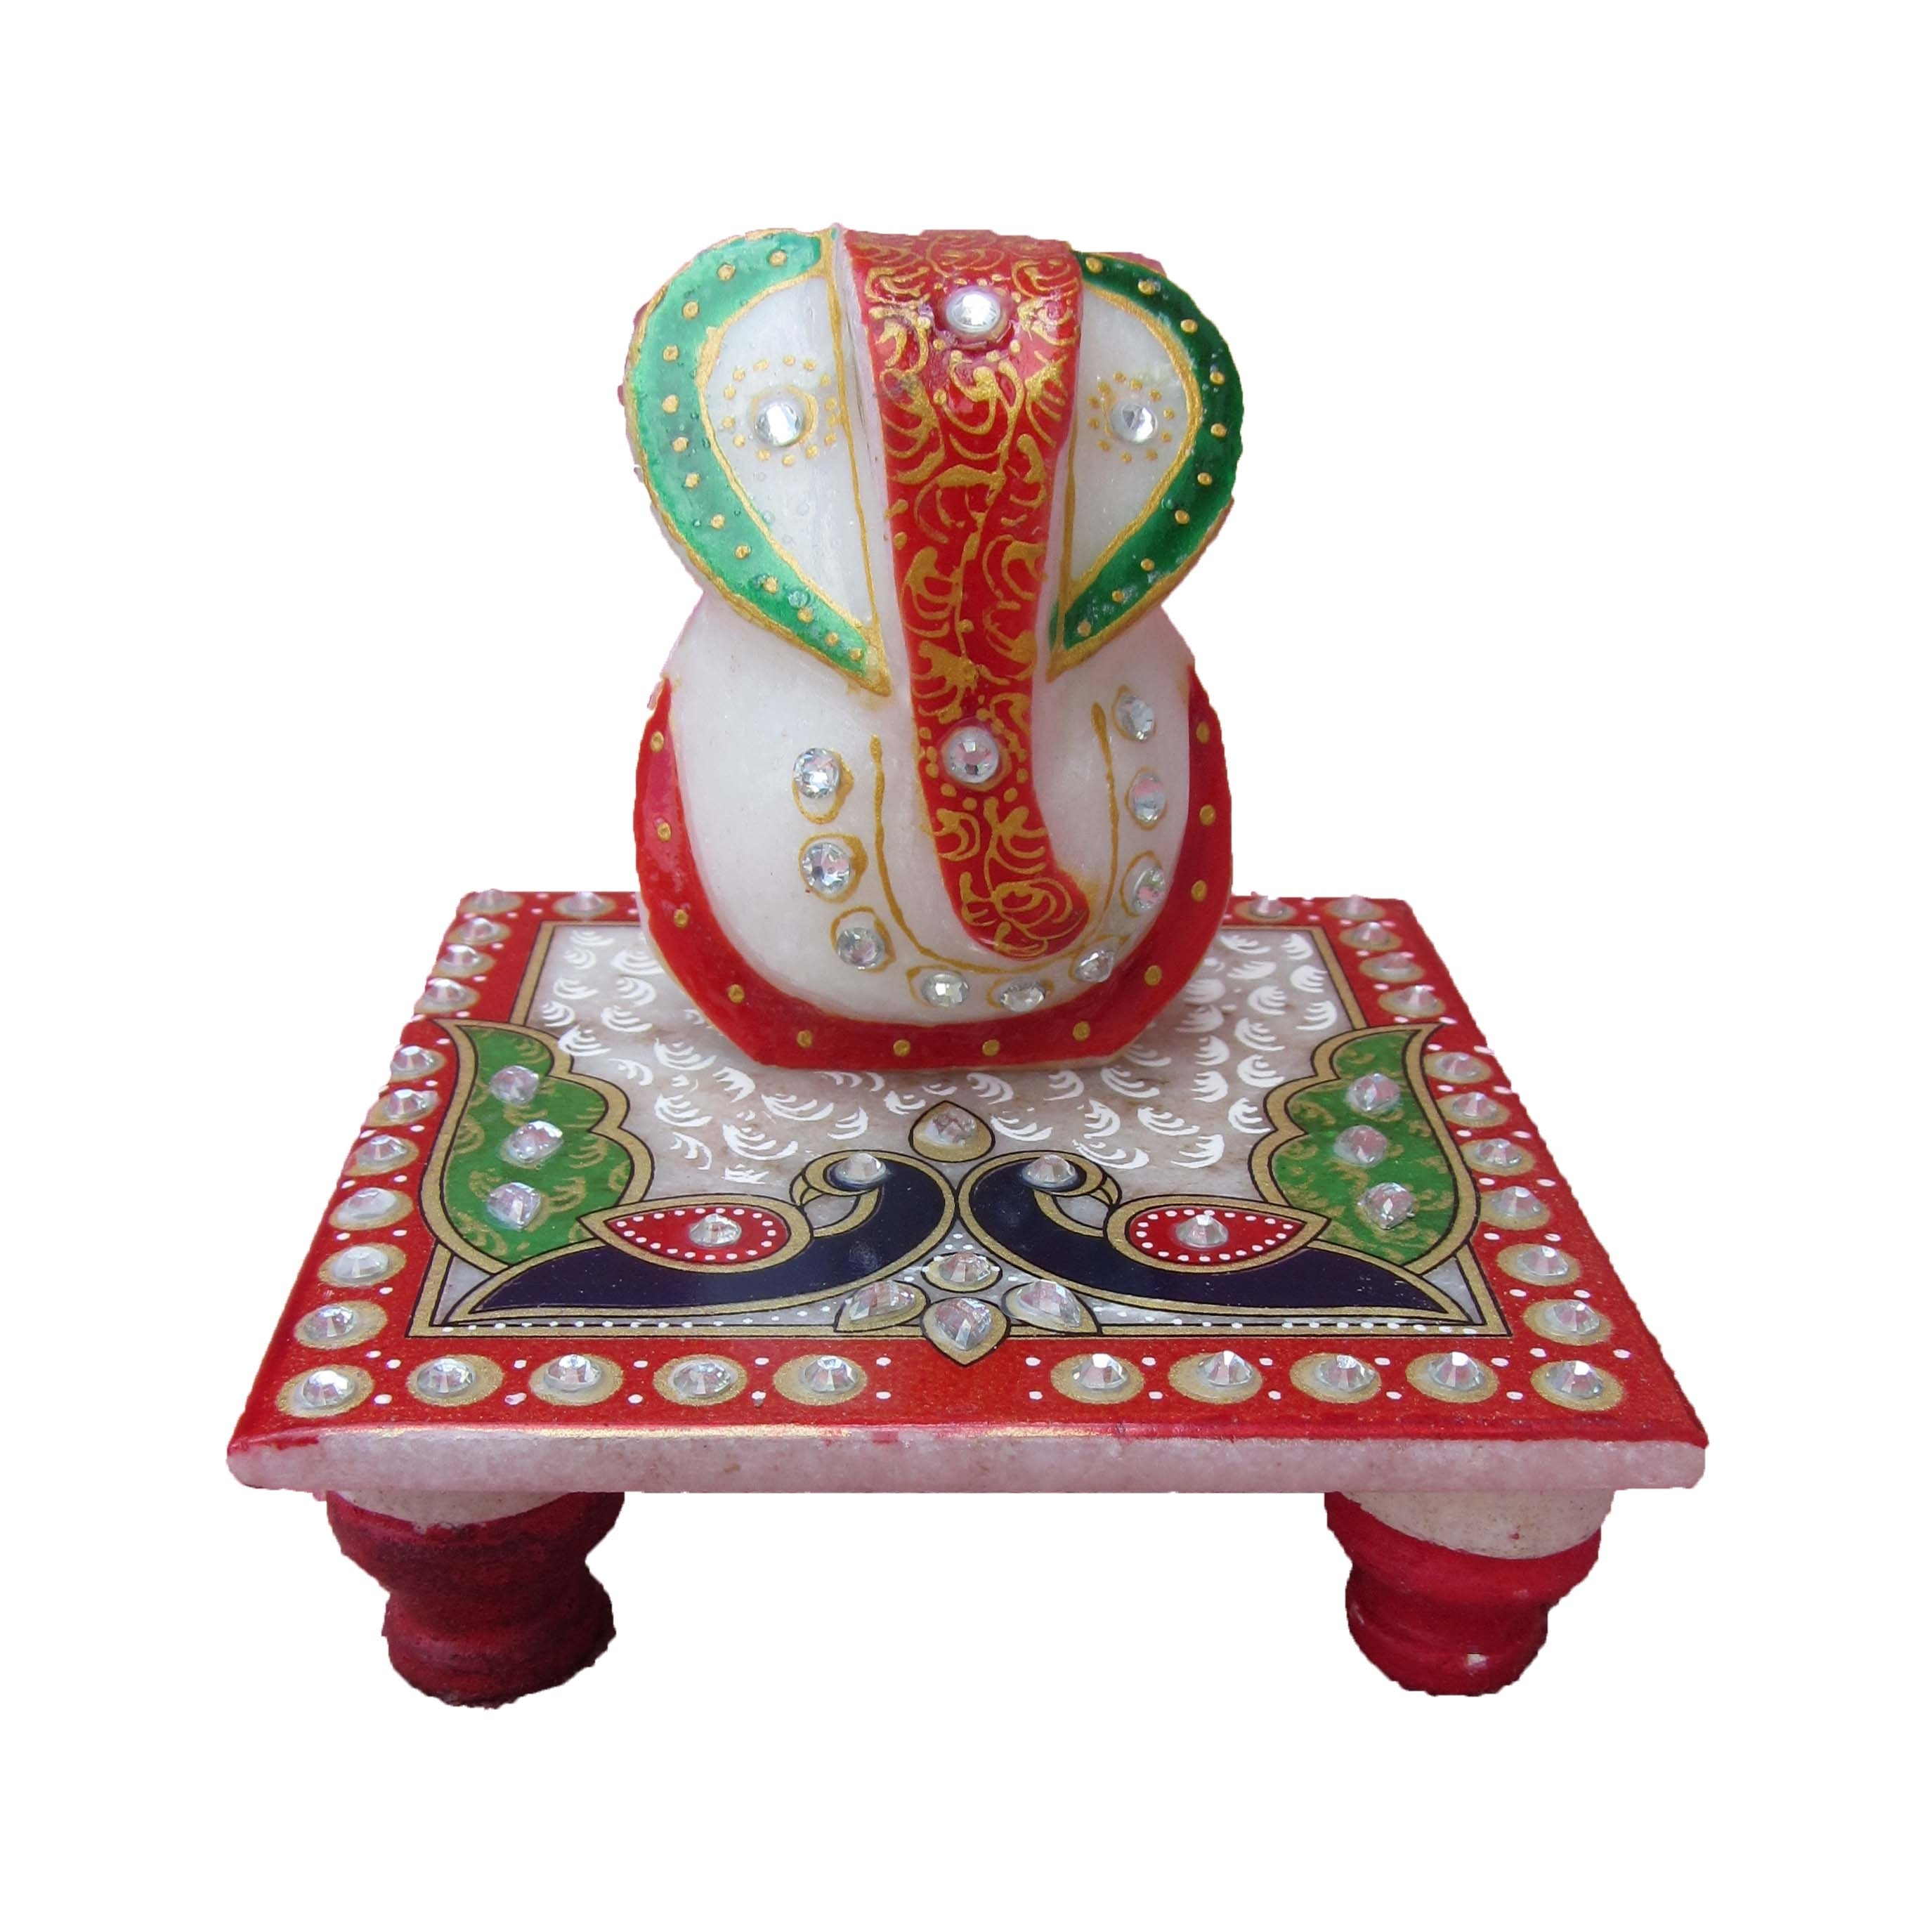 Lord Ganesha with Peacock on Chowki Indian Home Decor